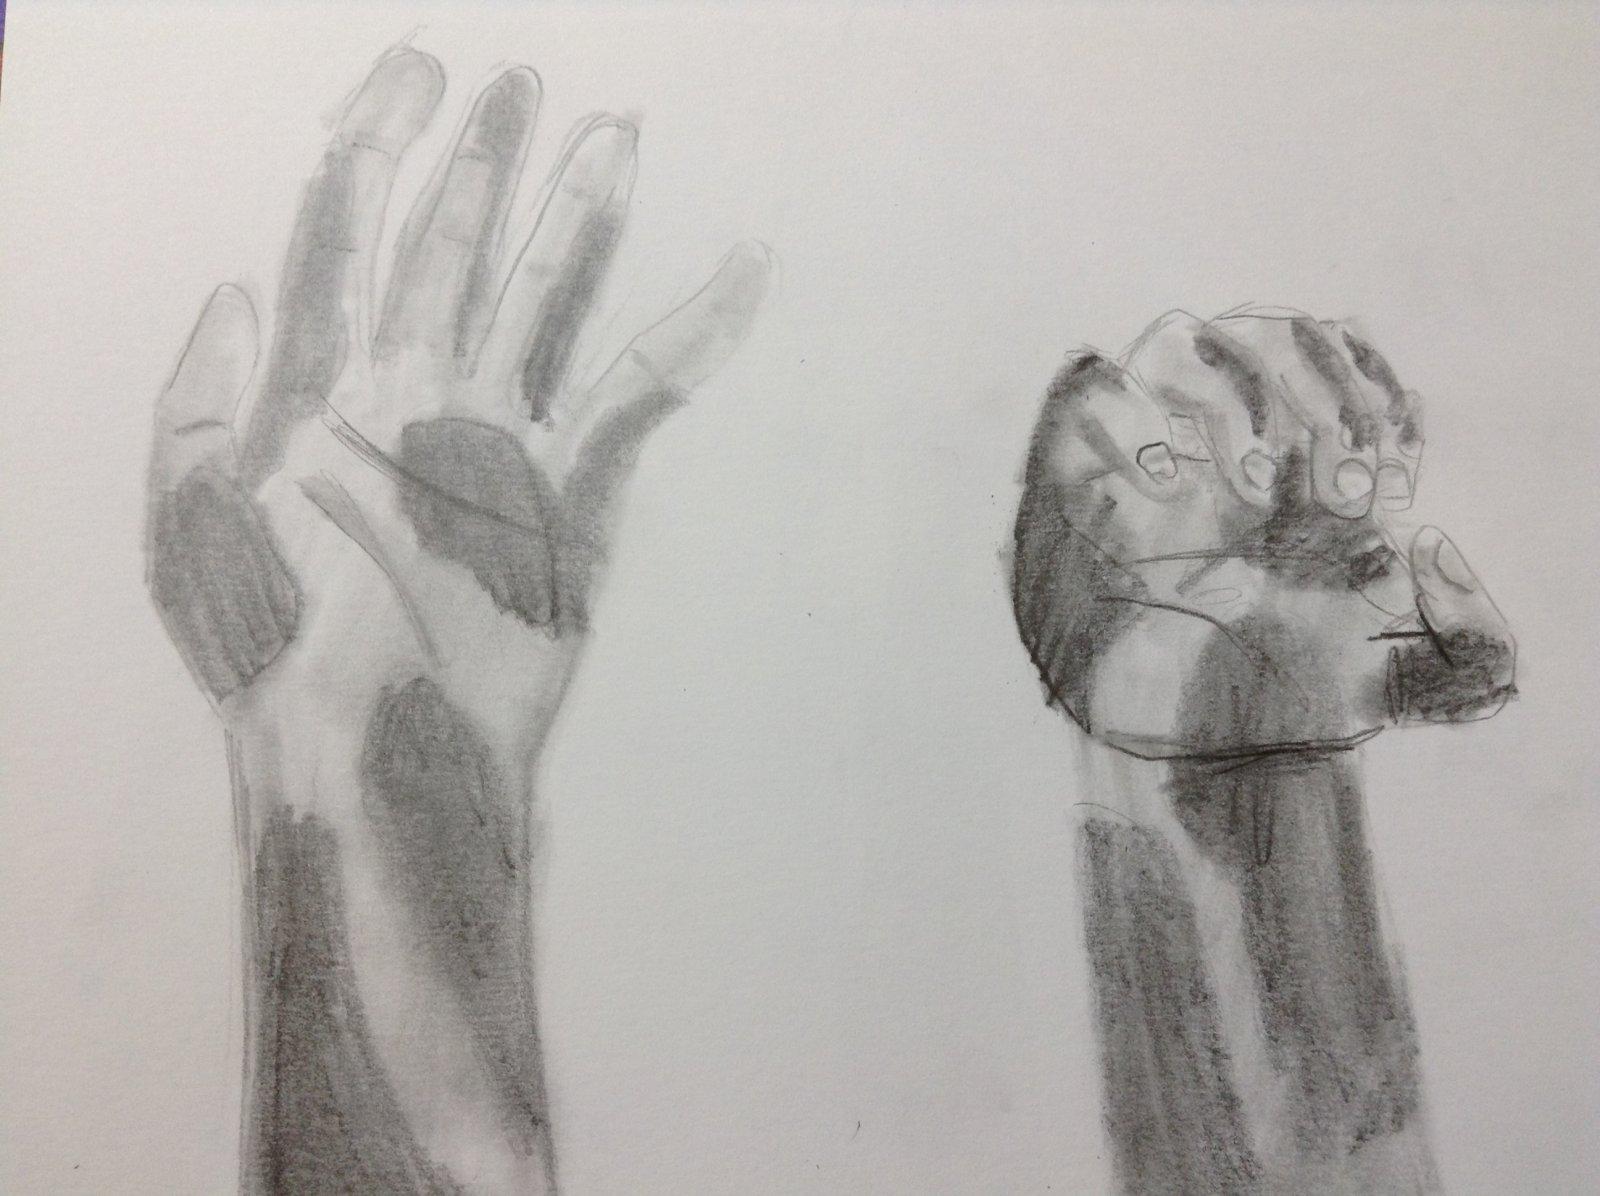 Elantrian Hands